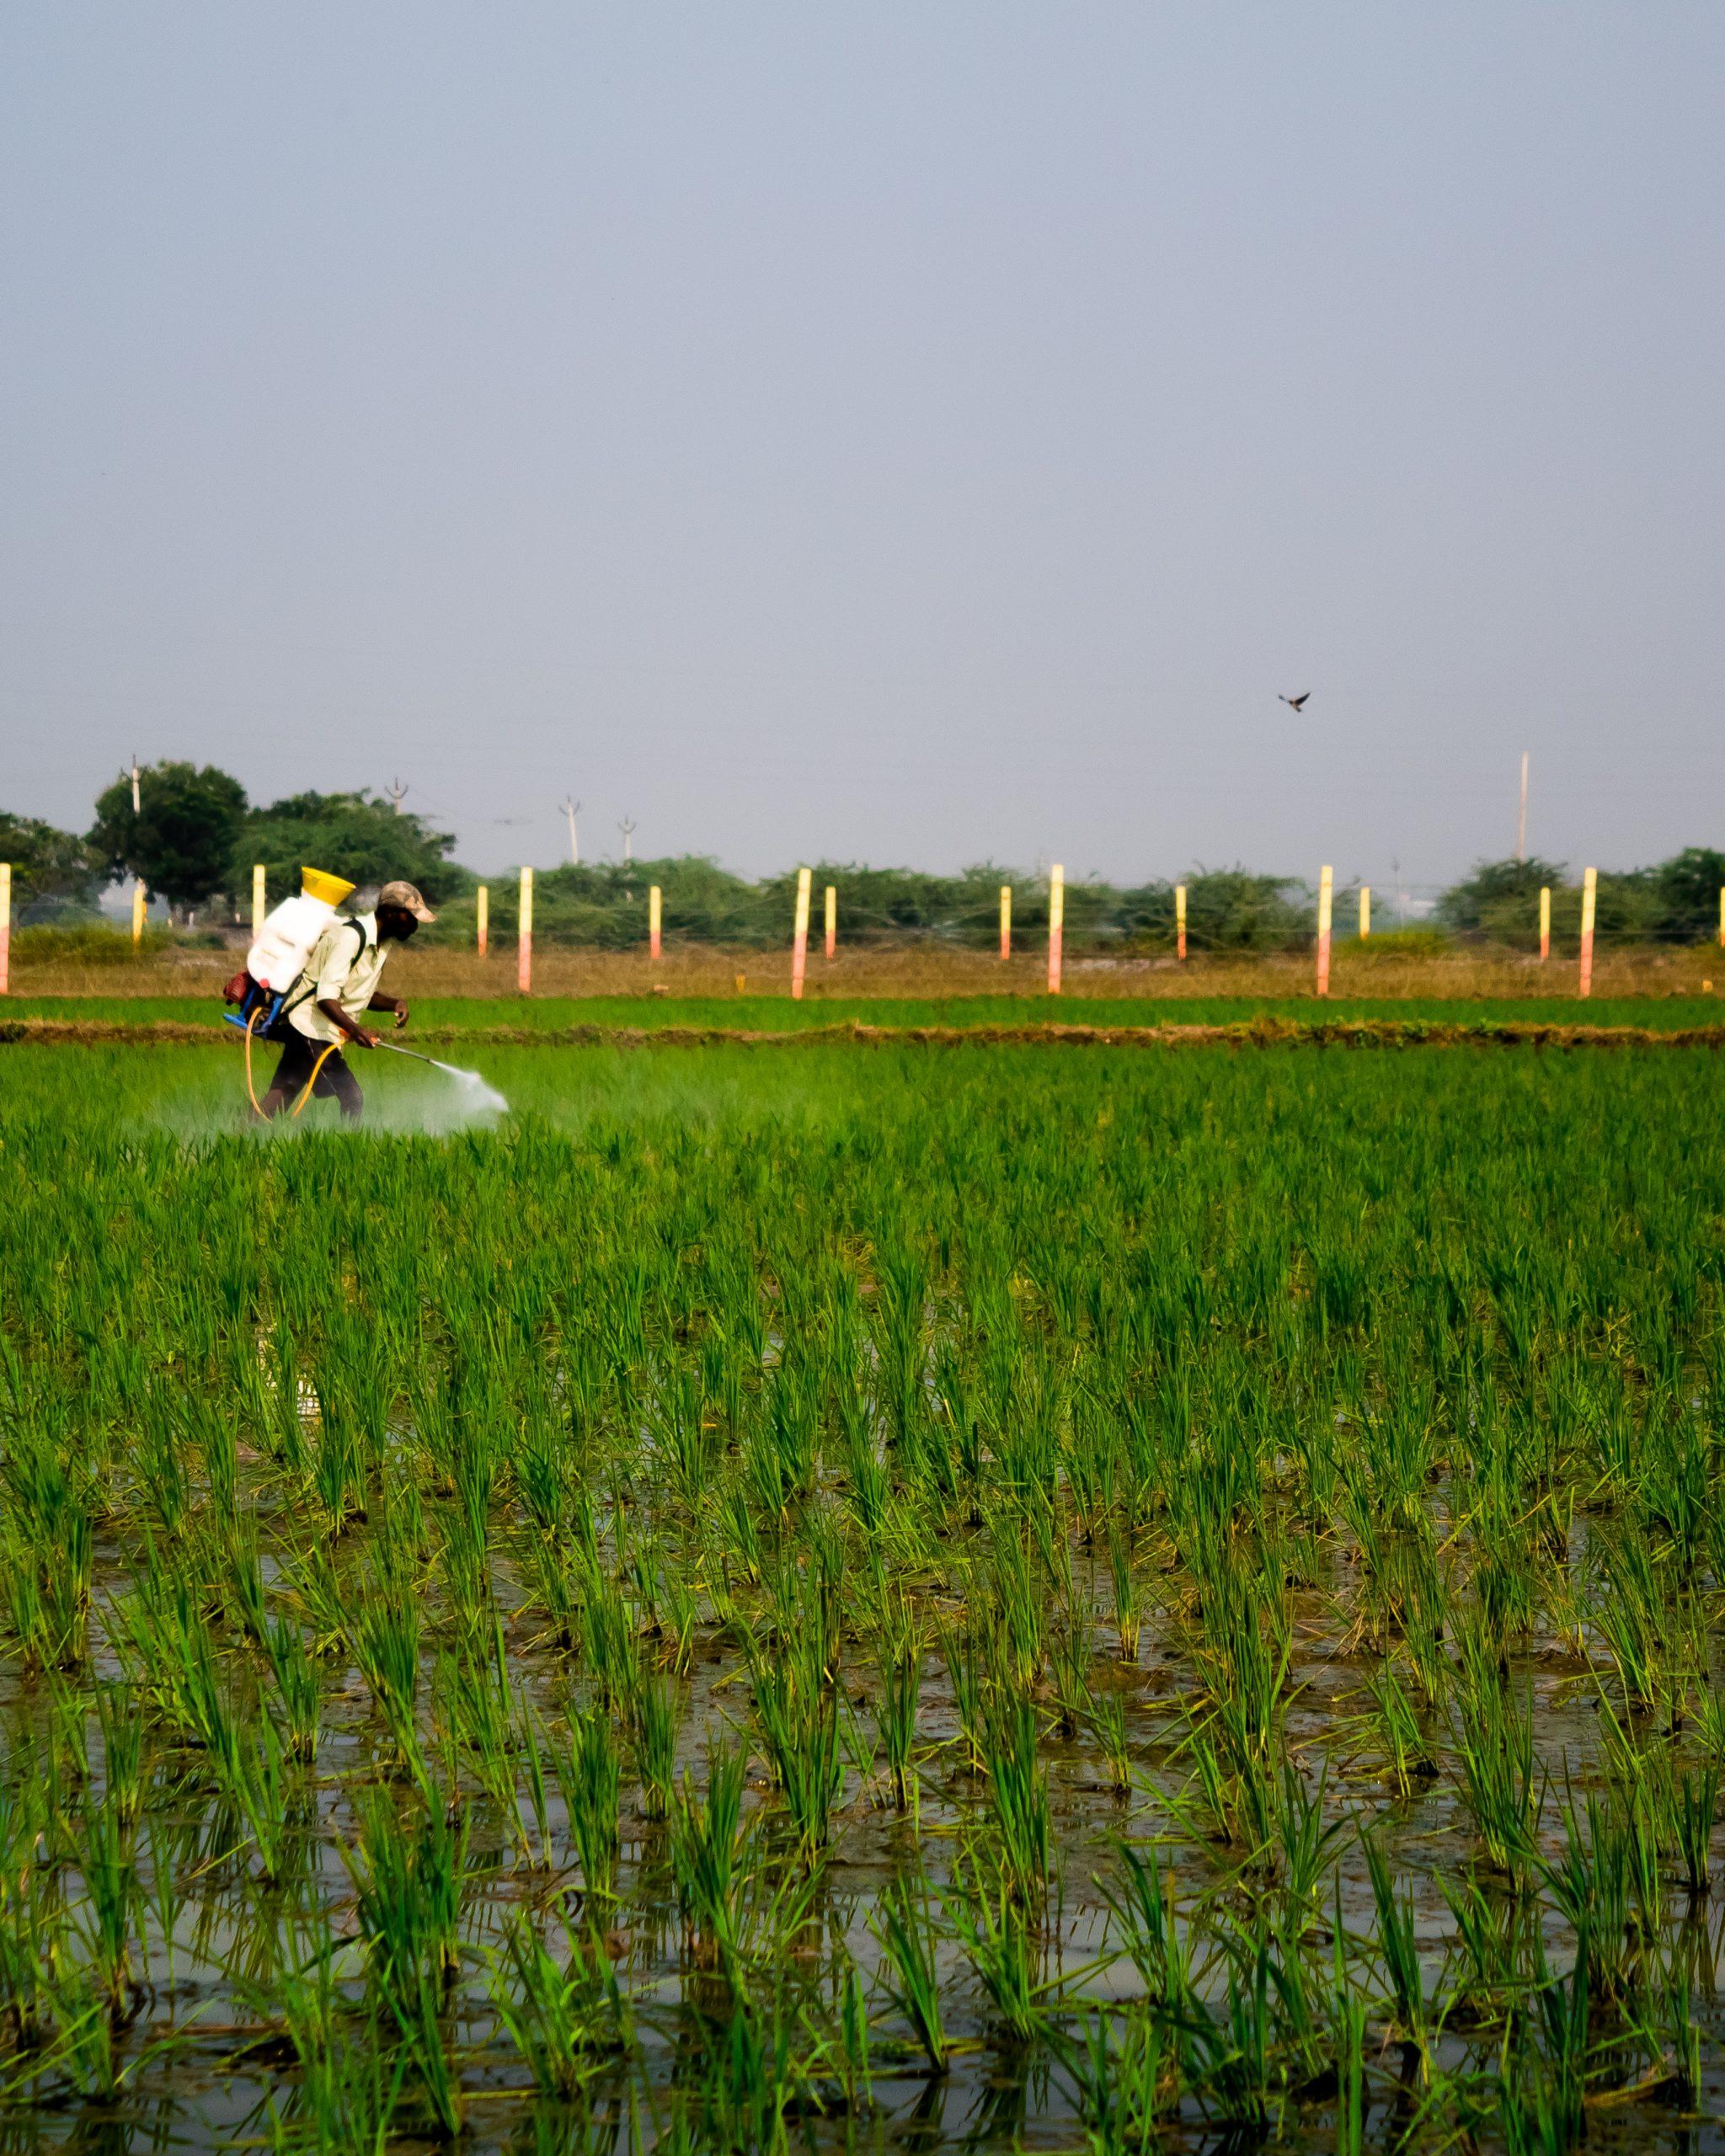 A farmer spraying pesticides in paddy field